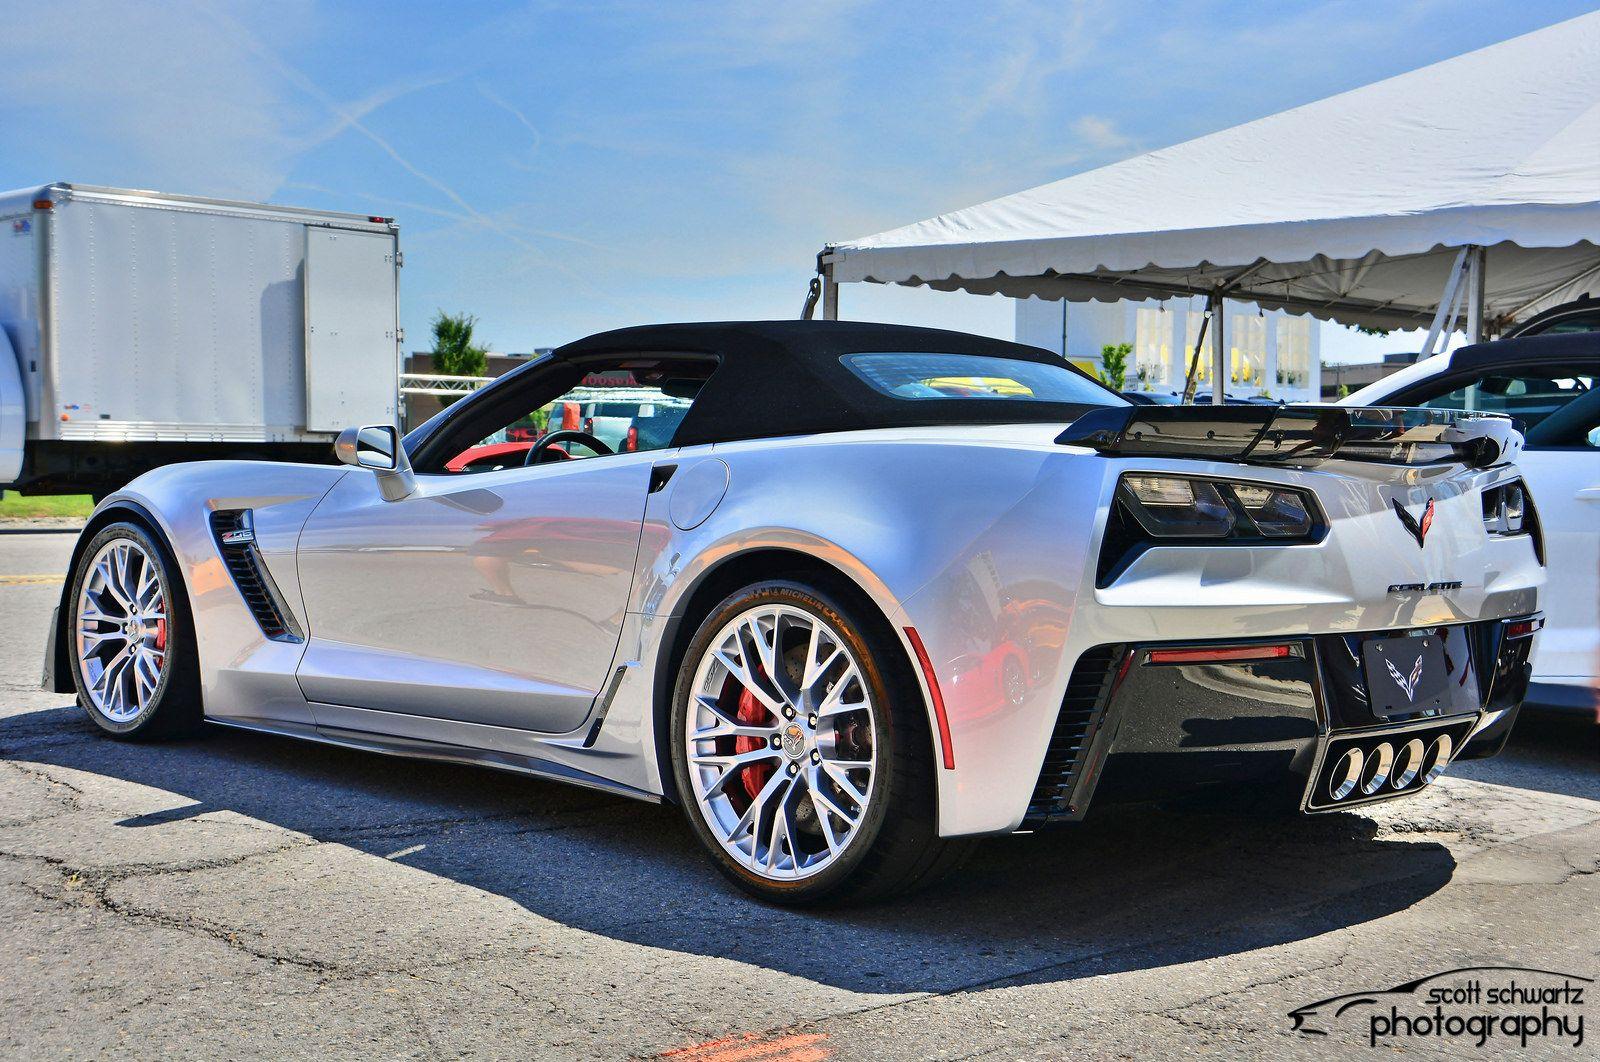 2015 C7 Corvette Z06 Convertible Corvette Corvette Convertible Corvette Z06